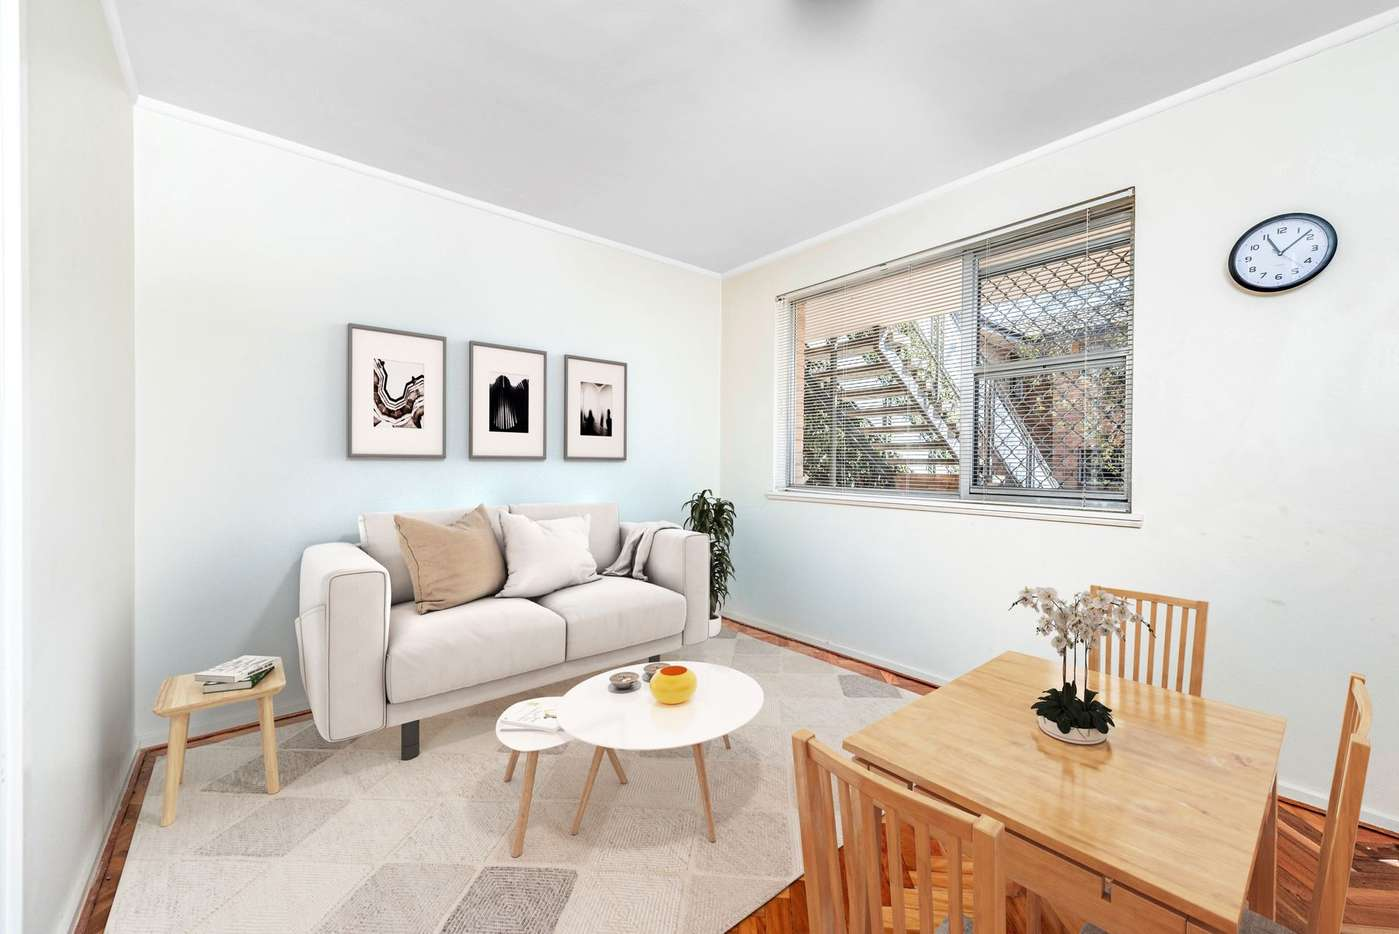 Main view of Homely apartment listing, 7/51 Hampton Circuit, Yarralumla, ACT 2600